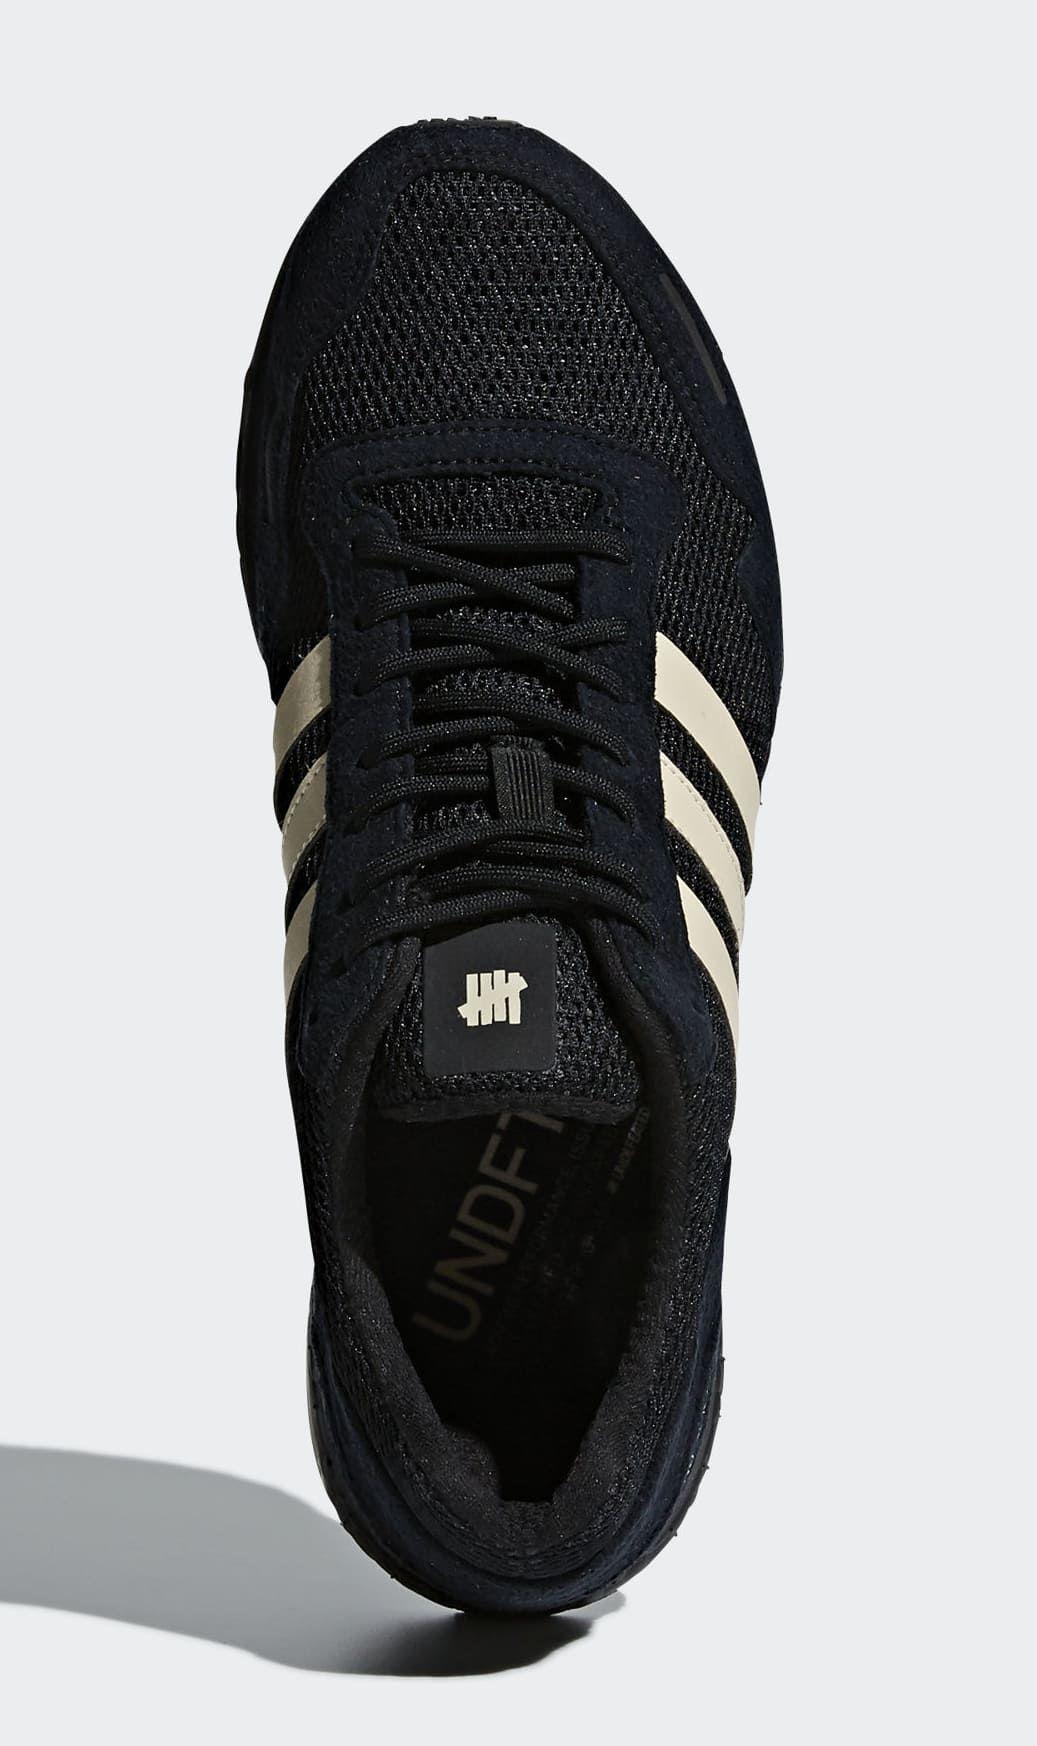 new styles 05734 cb32f Undefeated x Adidas Adizero Adios 3 B22483 (Top) | Run/ Gym ...